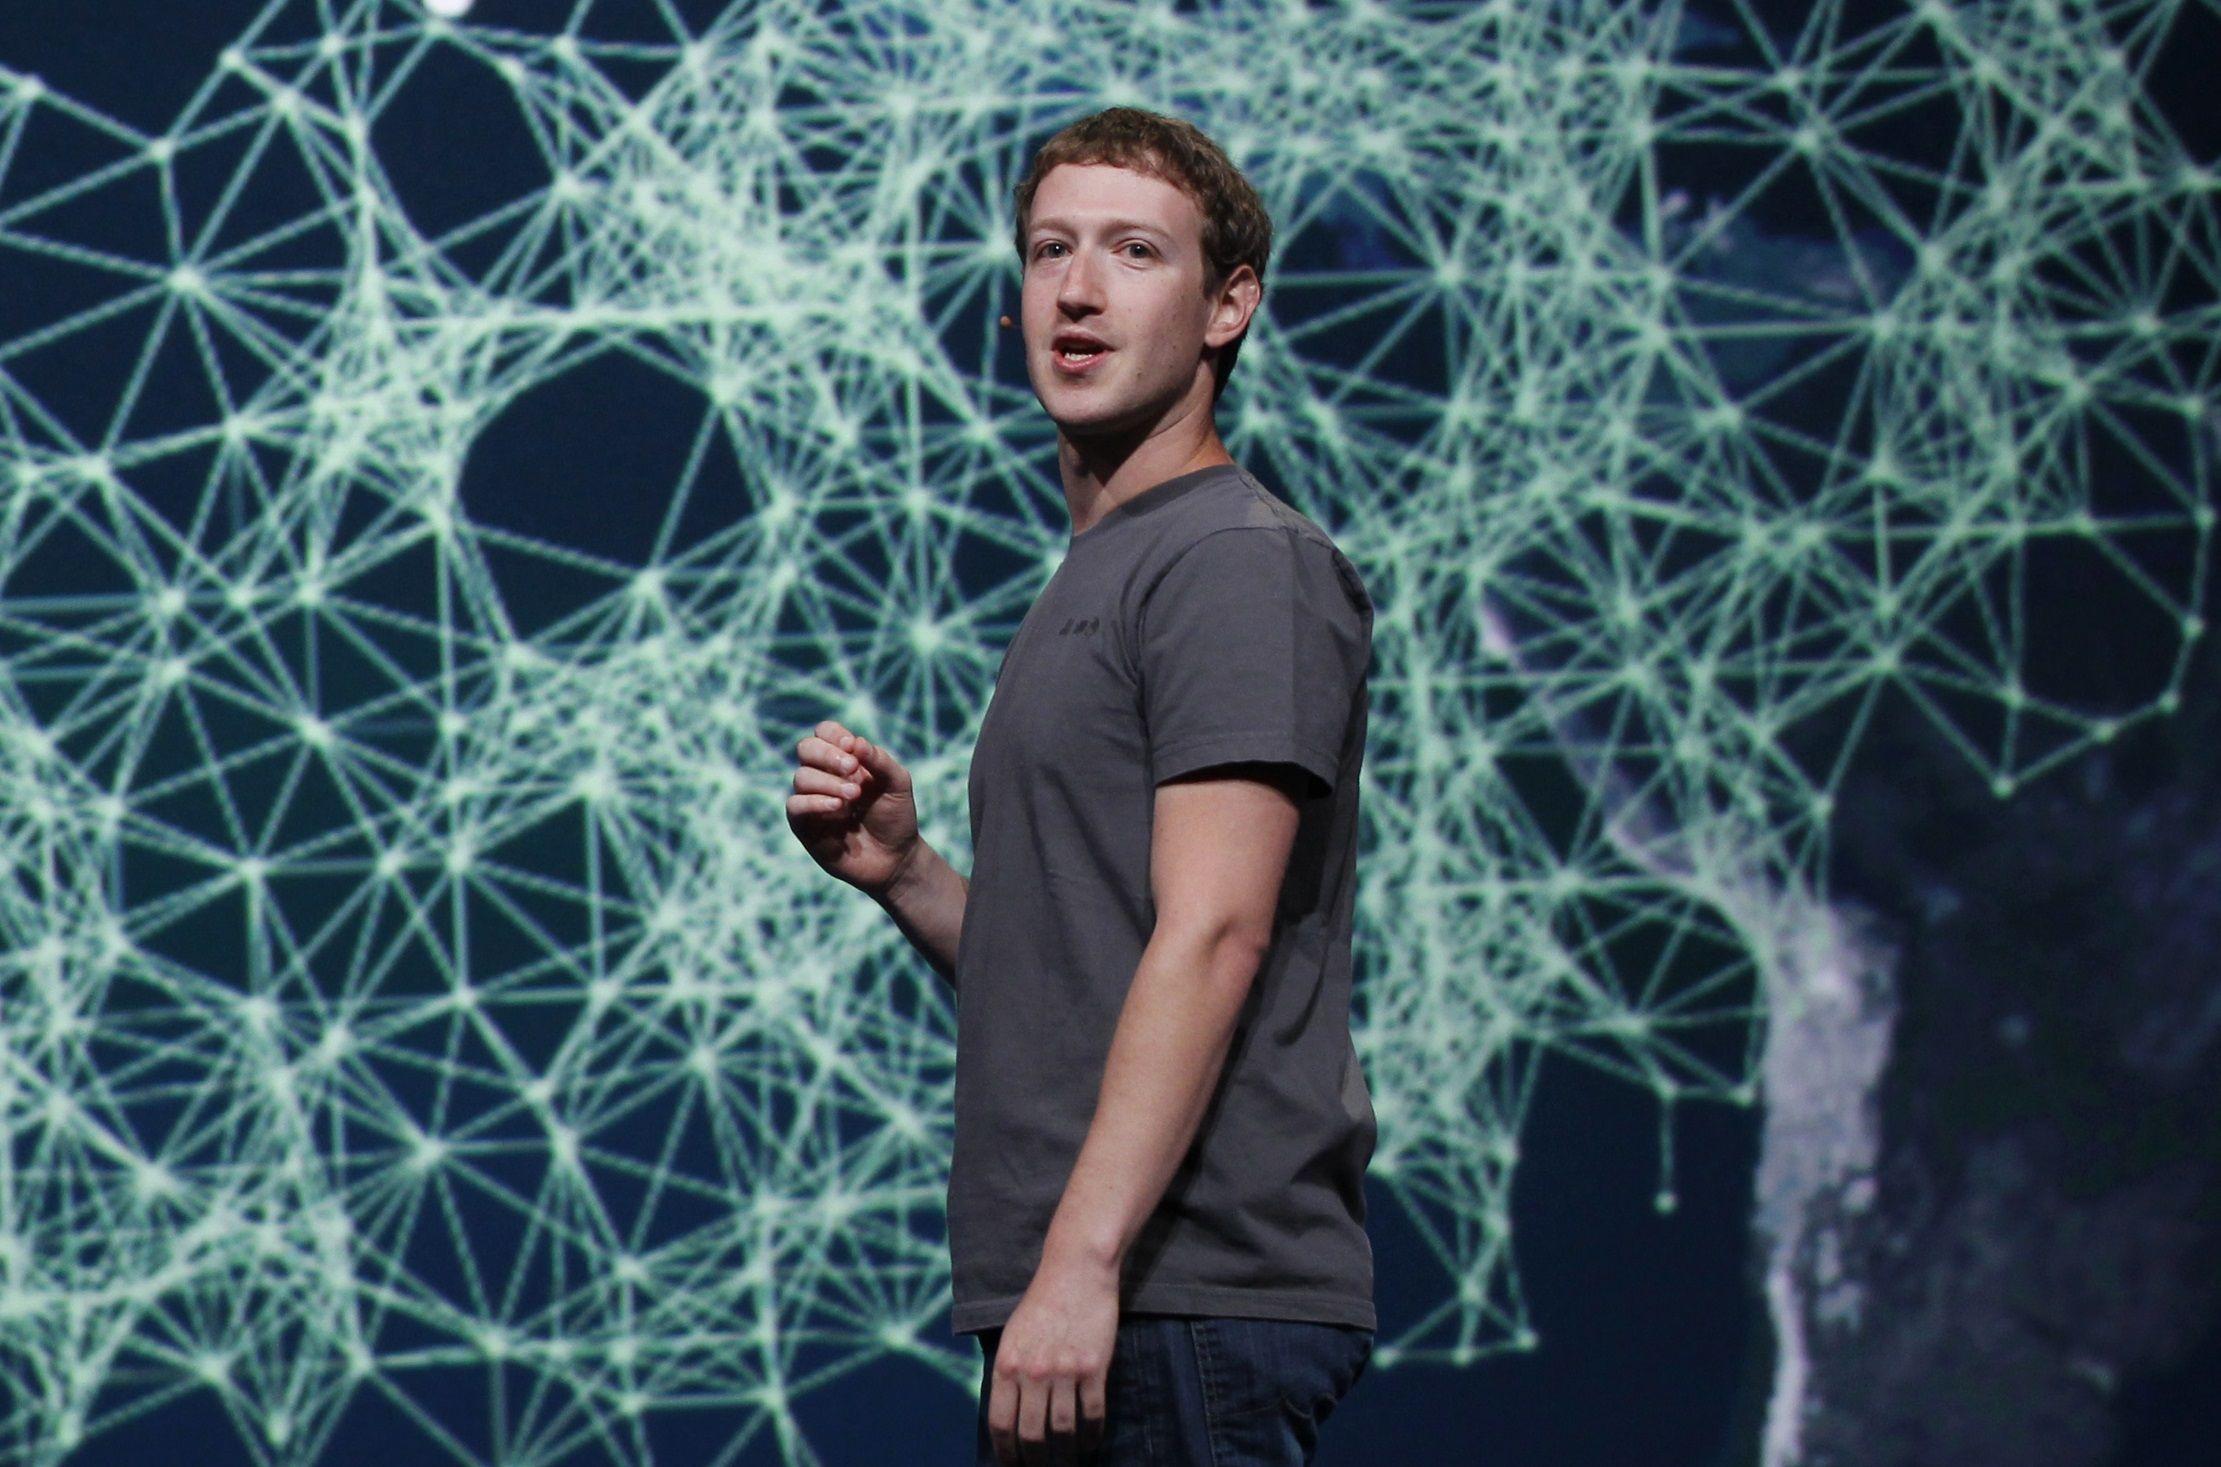 facebook six degrees of separation mark zuckerberg